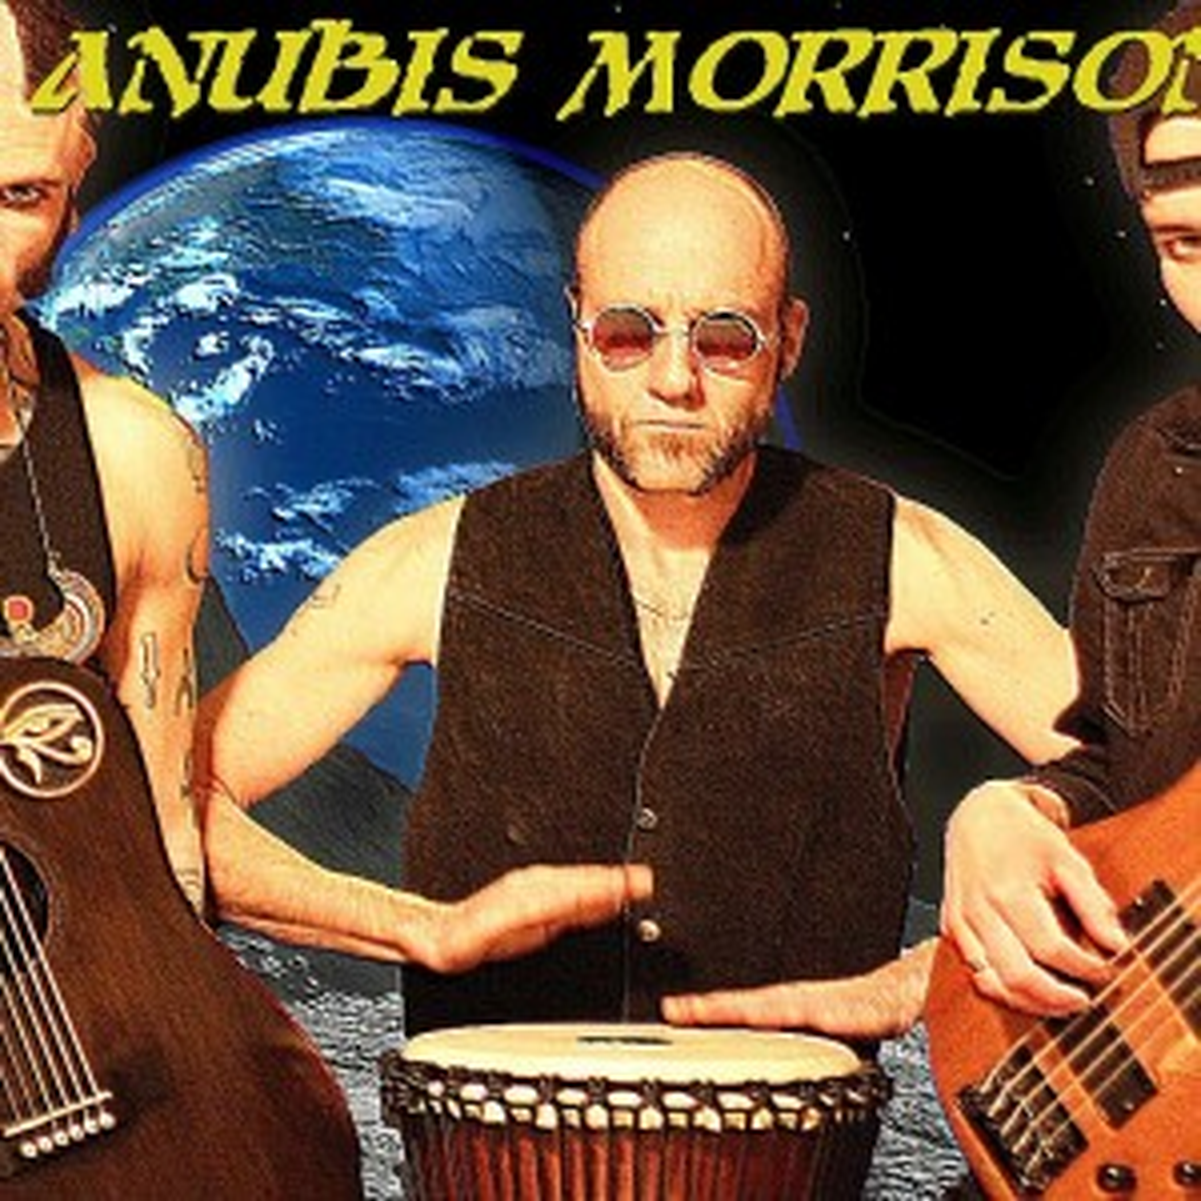 Anubis Morrison